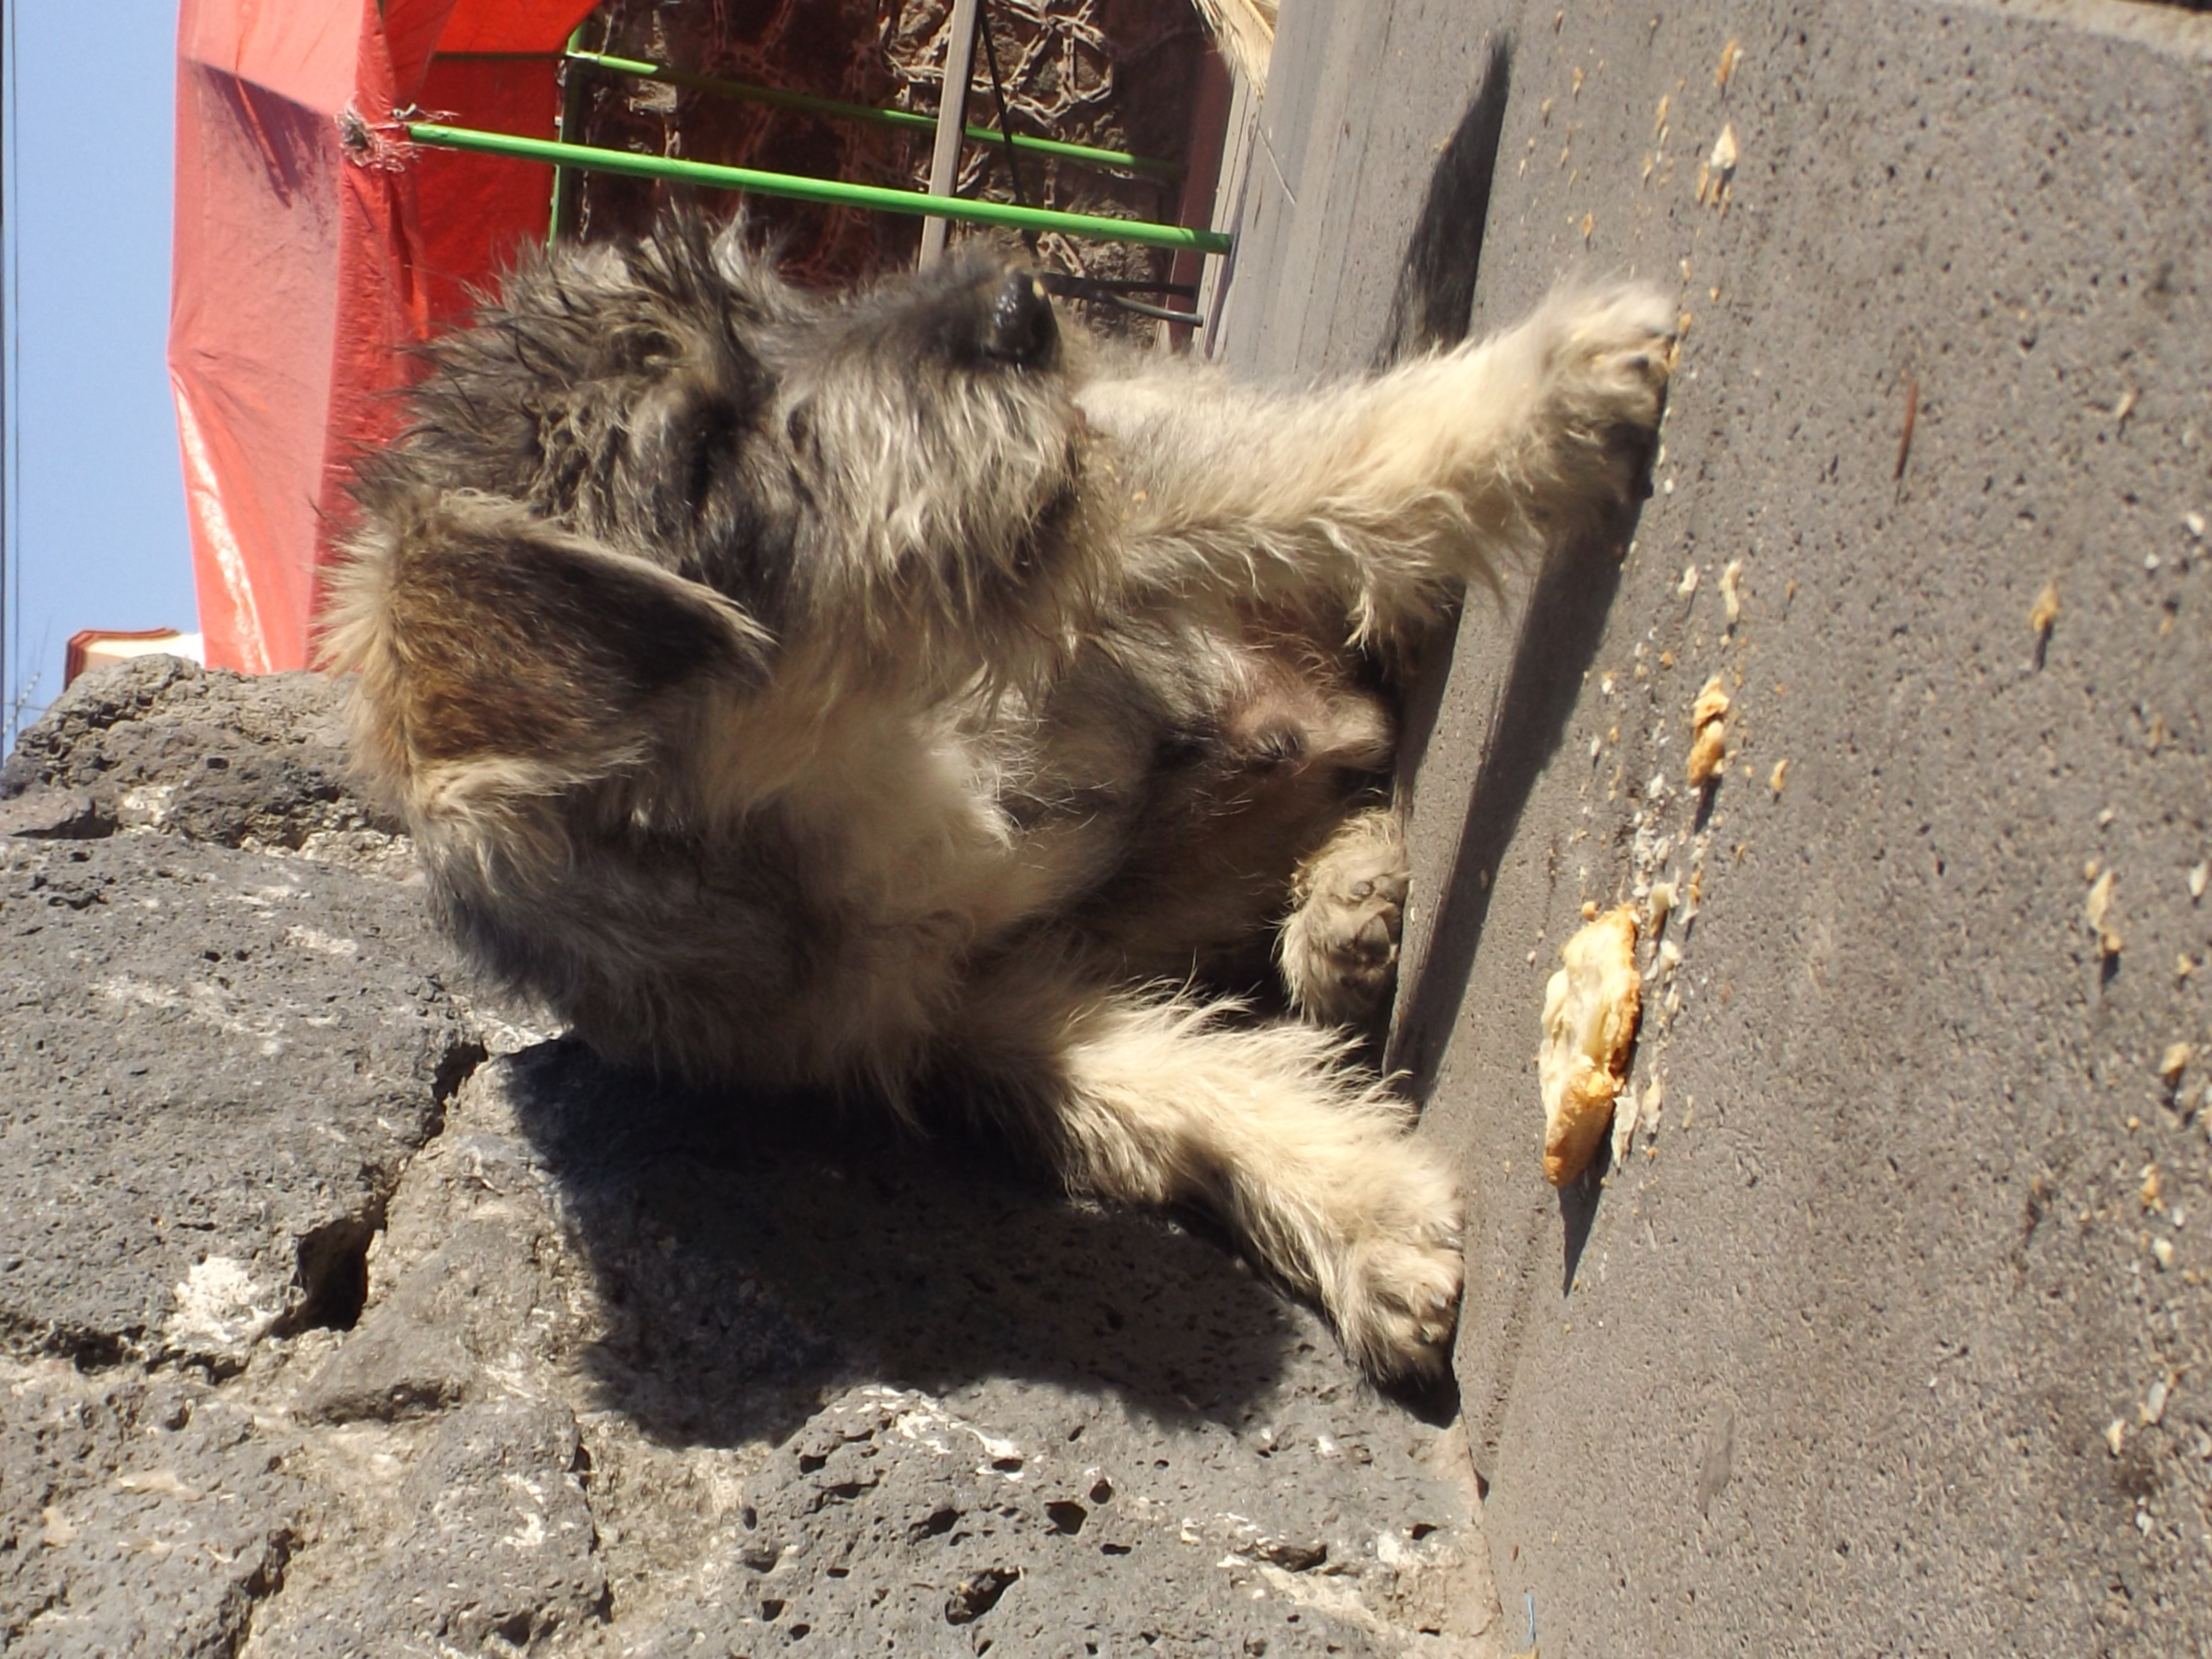 Iglesia de Visitación, Animal, Cat, Outdoor, Pet, HQ Photo